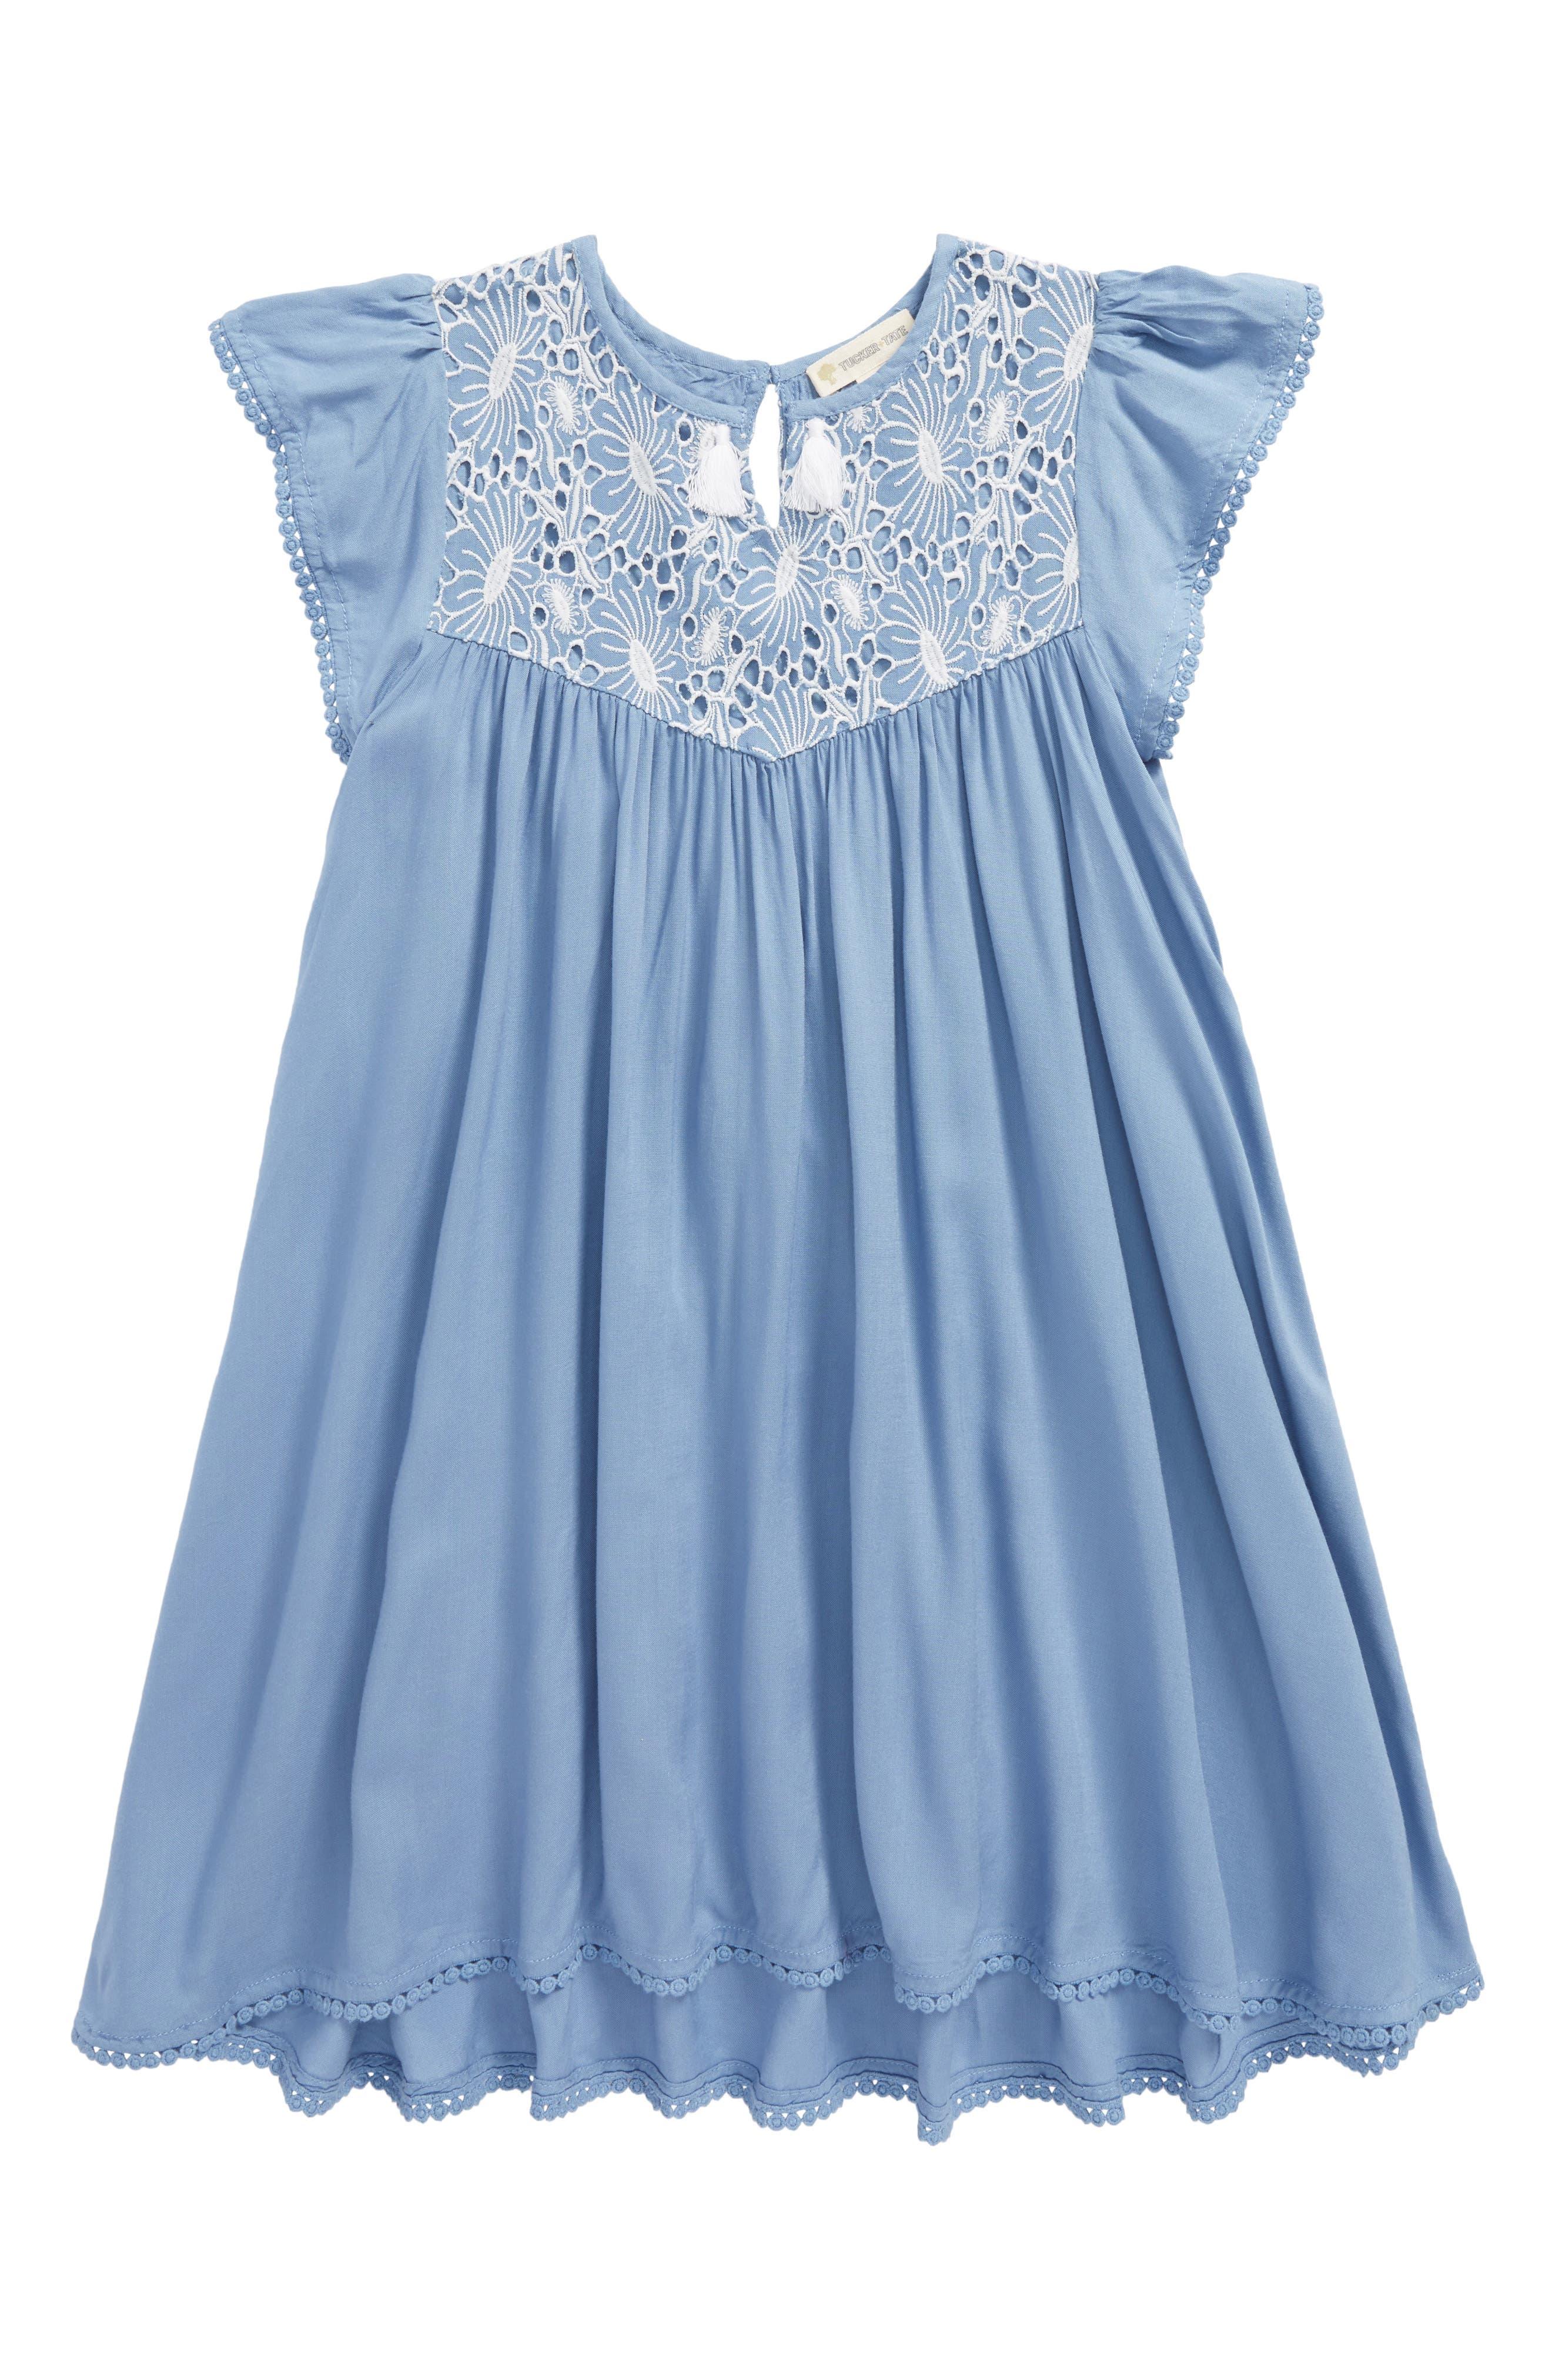 Embroidered Tassel Dress,                         Main,                         color, Blue